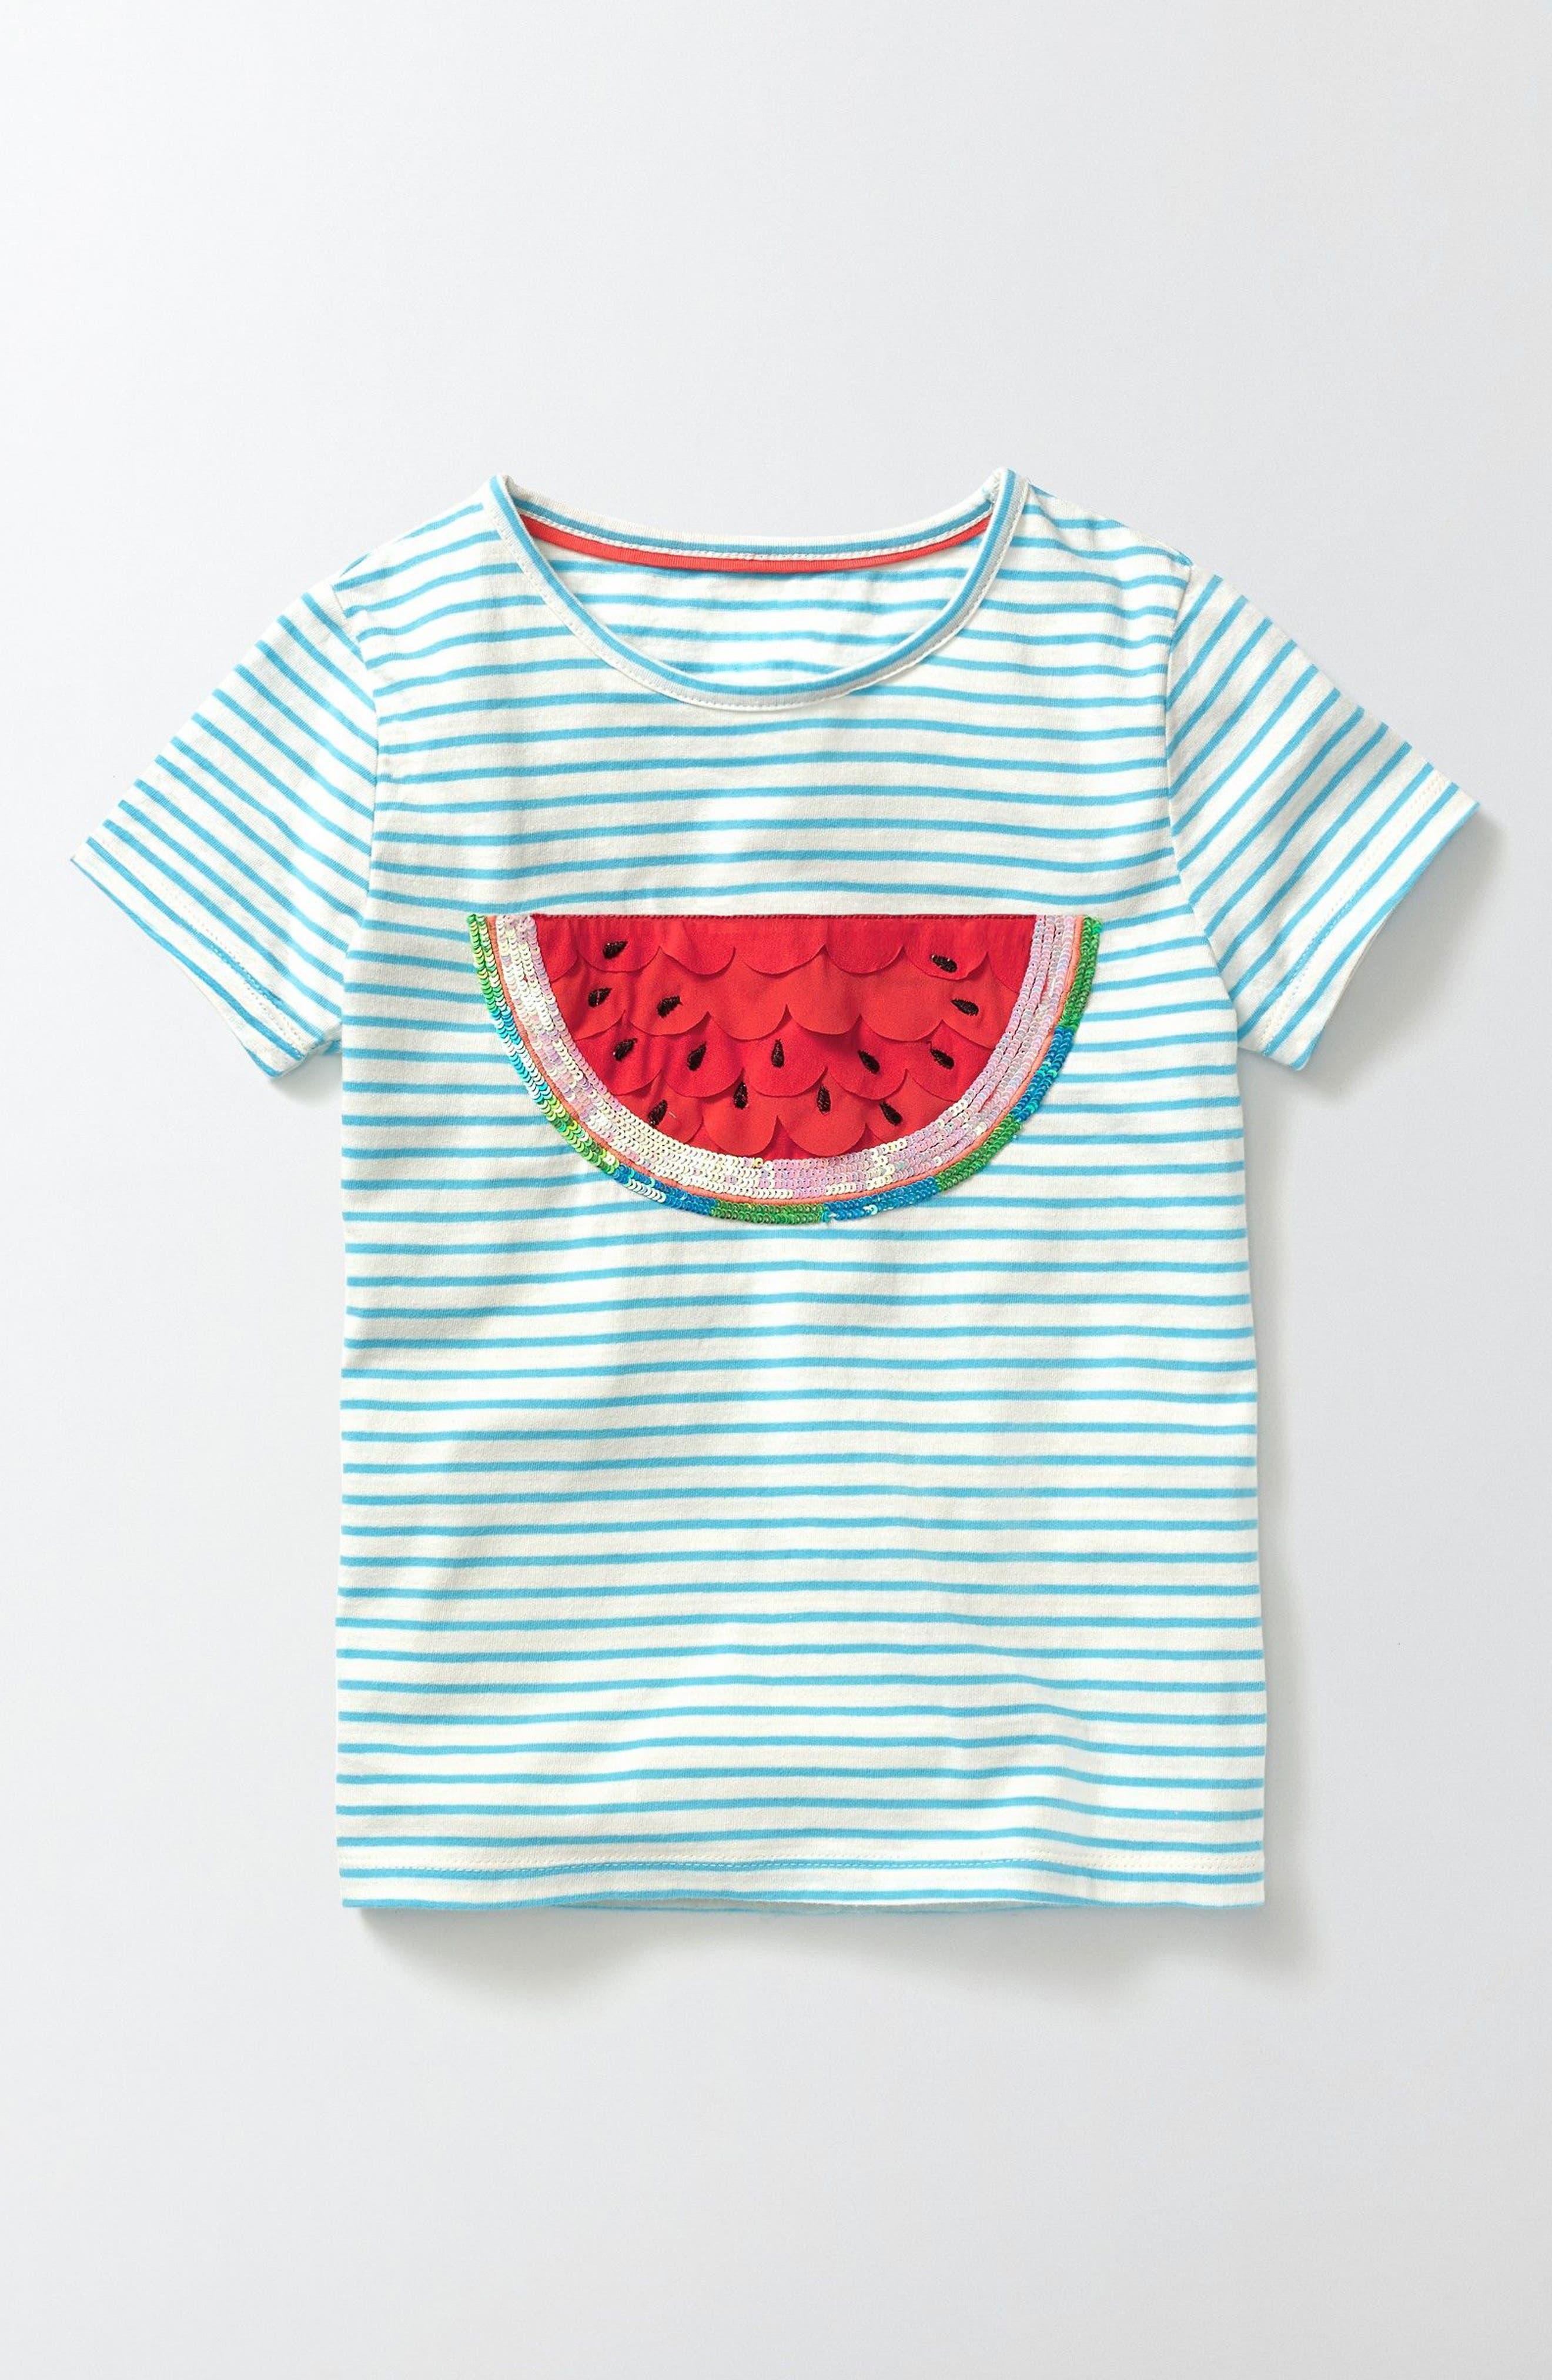 Mini Boden Fluttery Fruit Tee (Toddler Girls, Little Girls & Big Girls)